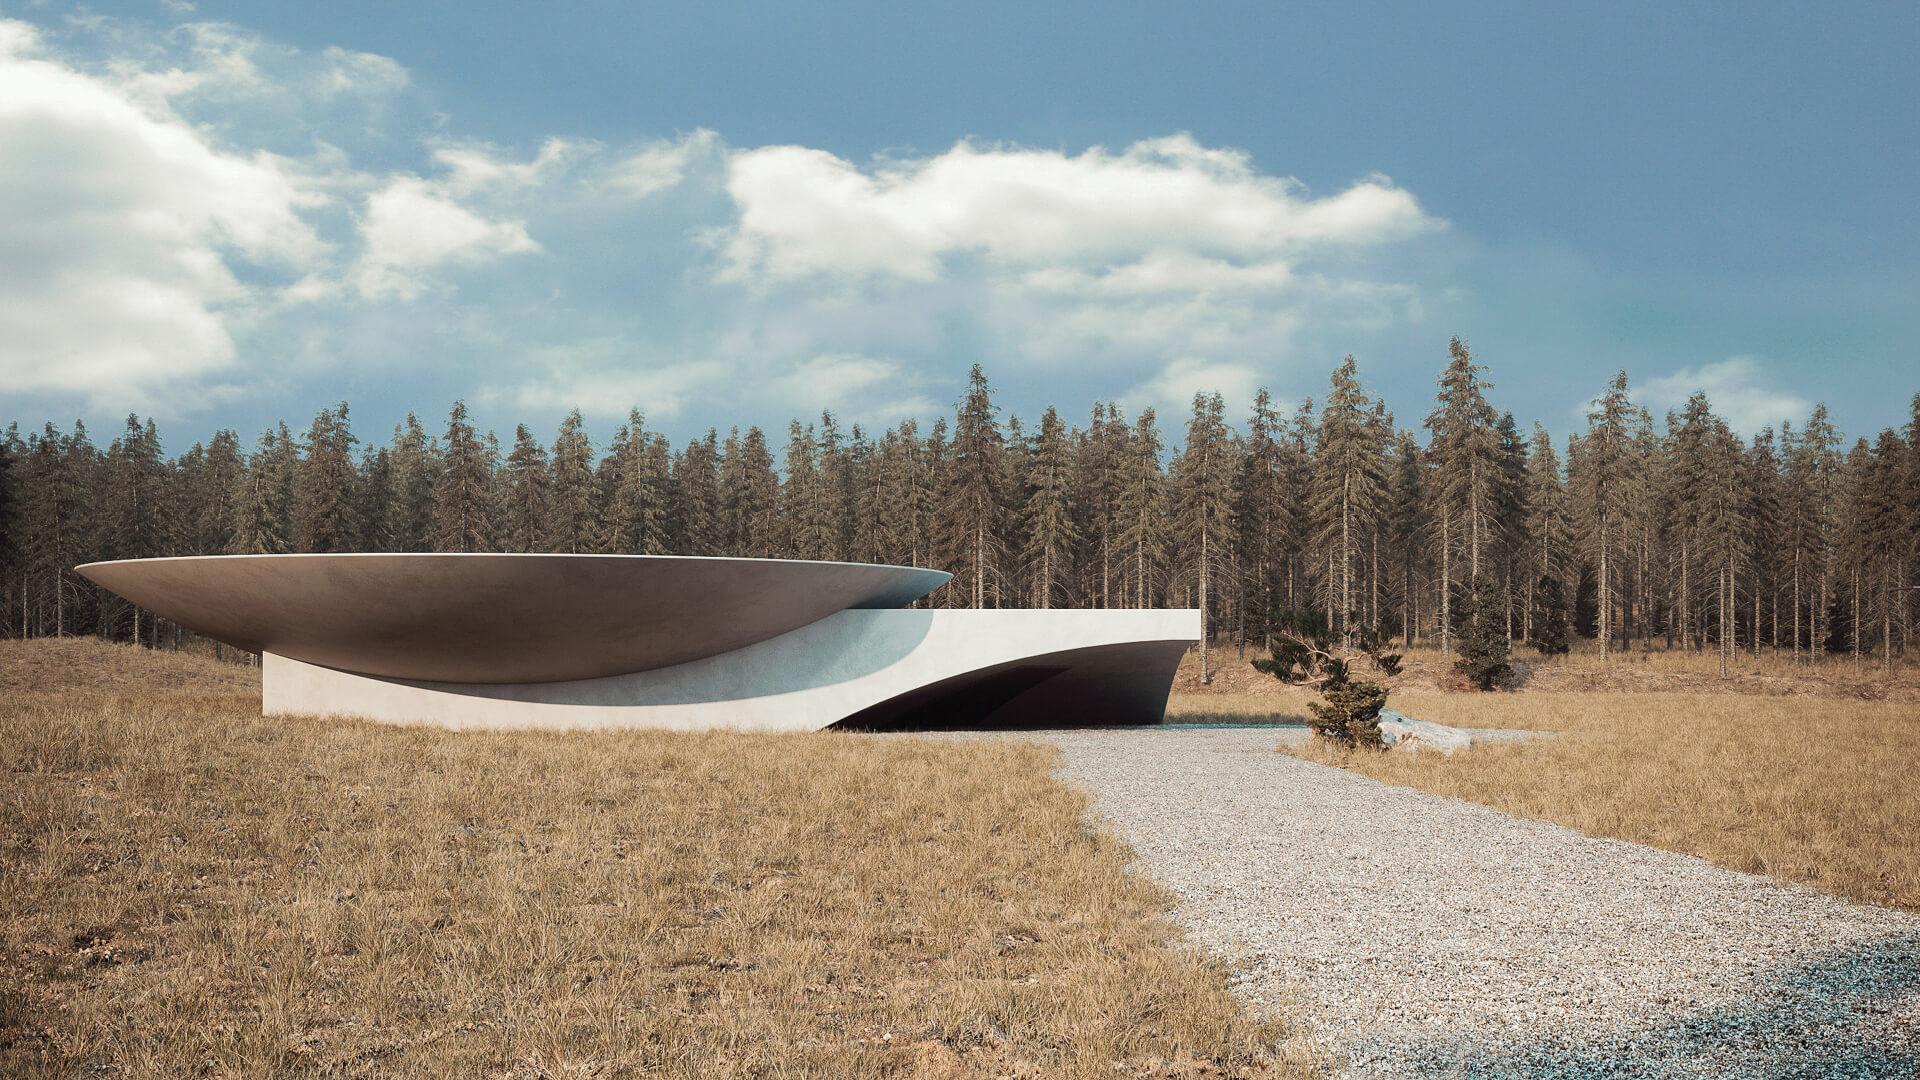 Underground House Plan B designed by Sergey Makhno Architects | STIRworld